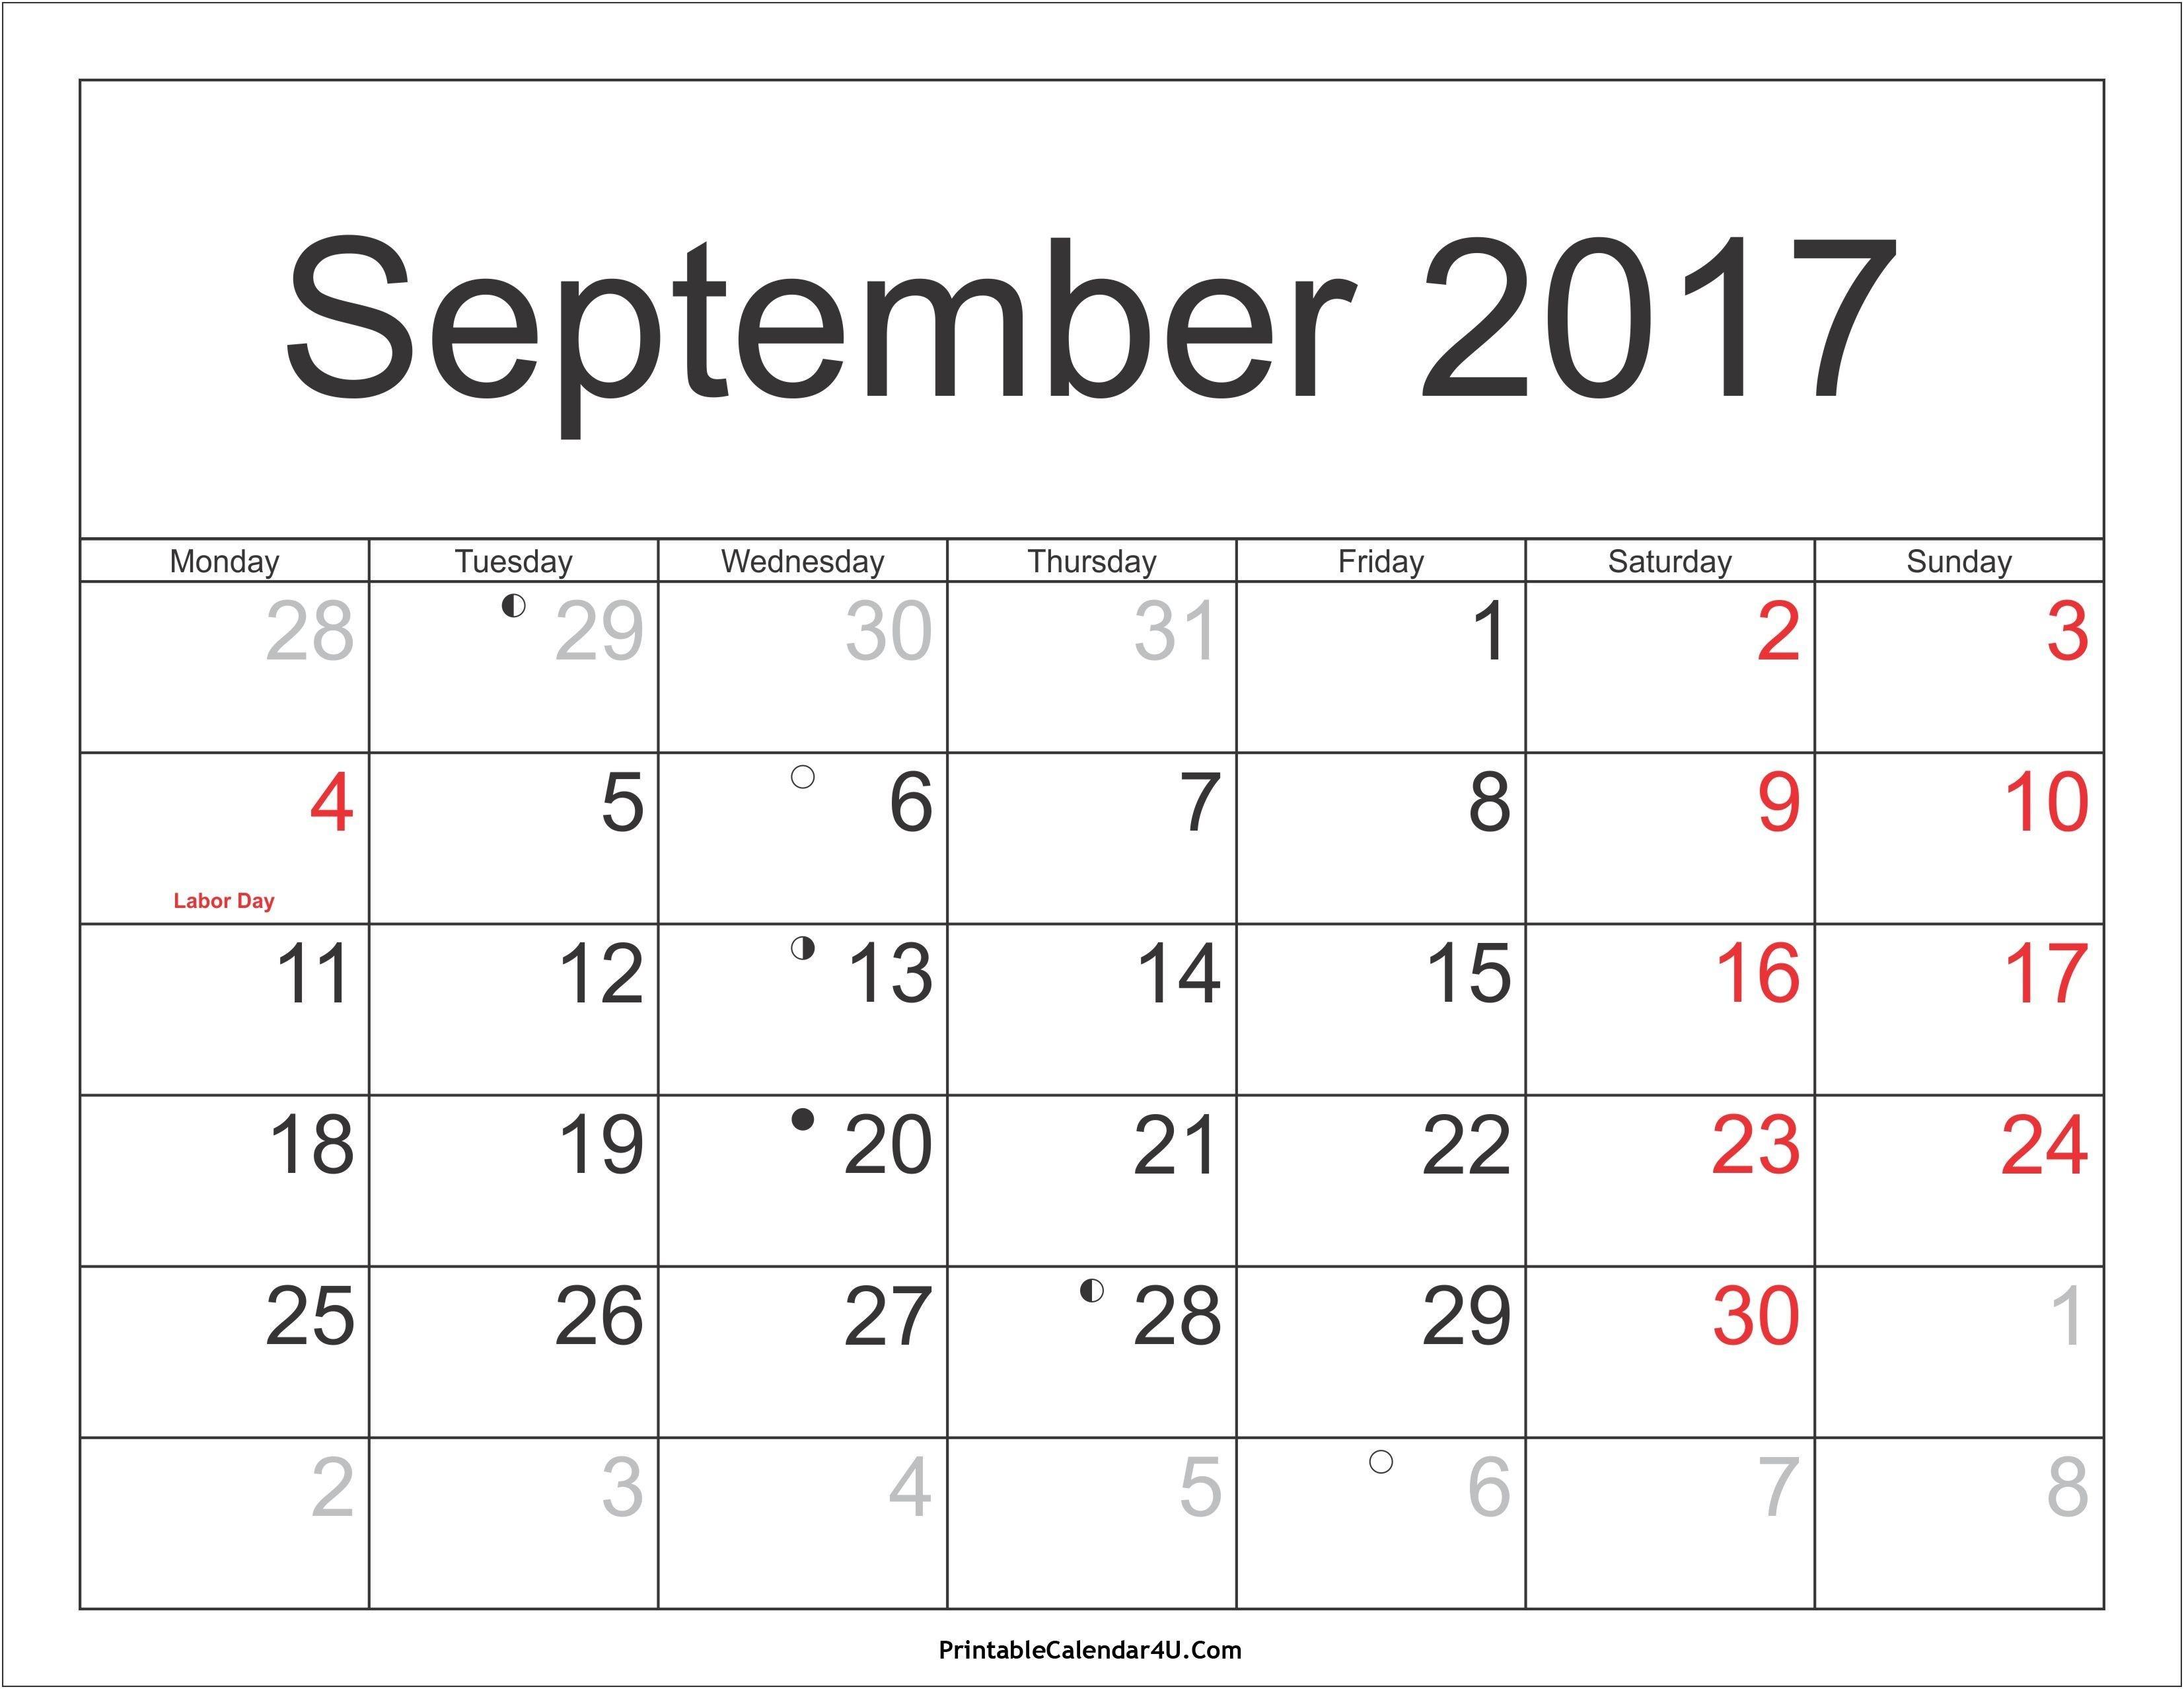 malayalam calendar 2019 free printable dec calendar 2017 printable december calendars unique of malayalam calendar 2019 free